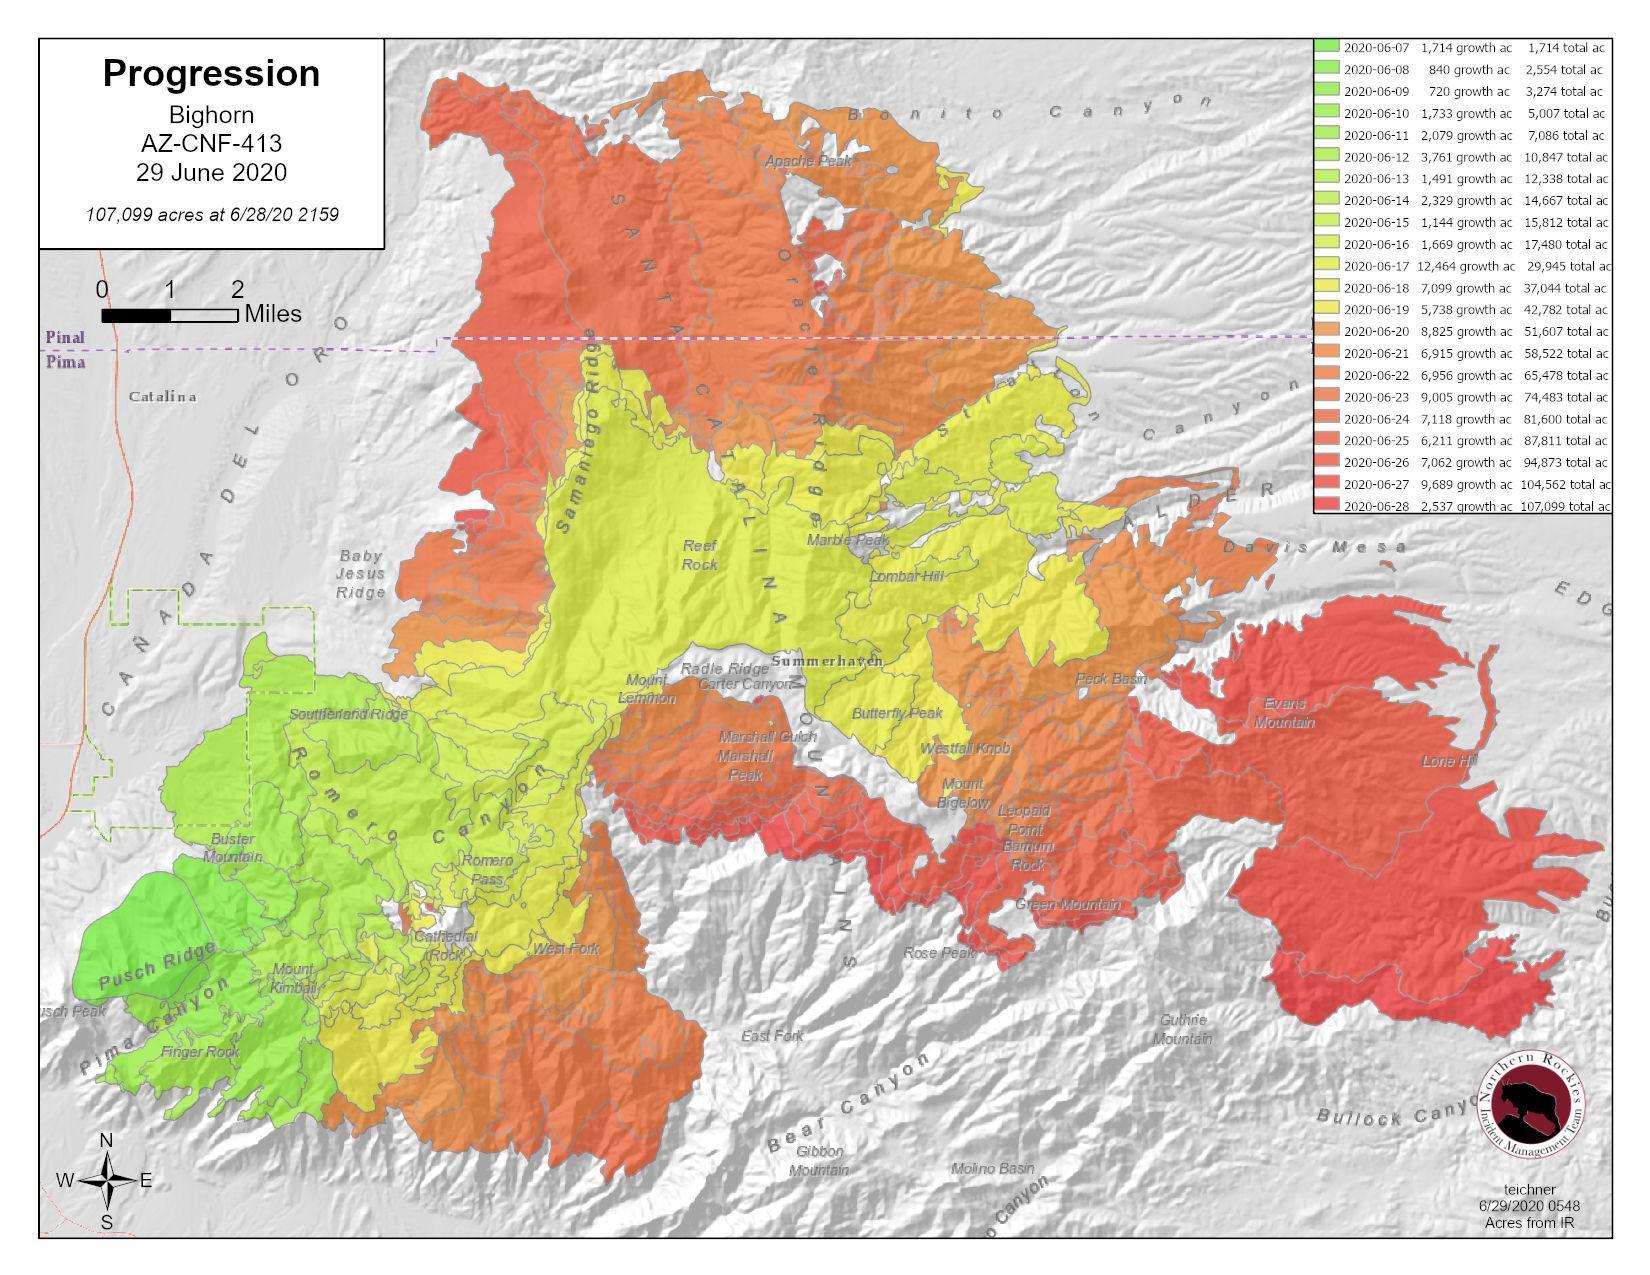 Bighorn Fire 6-29-20